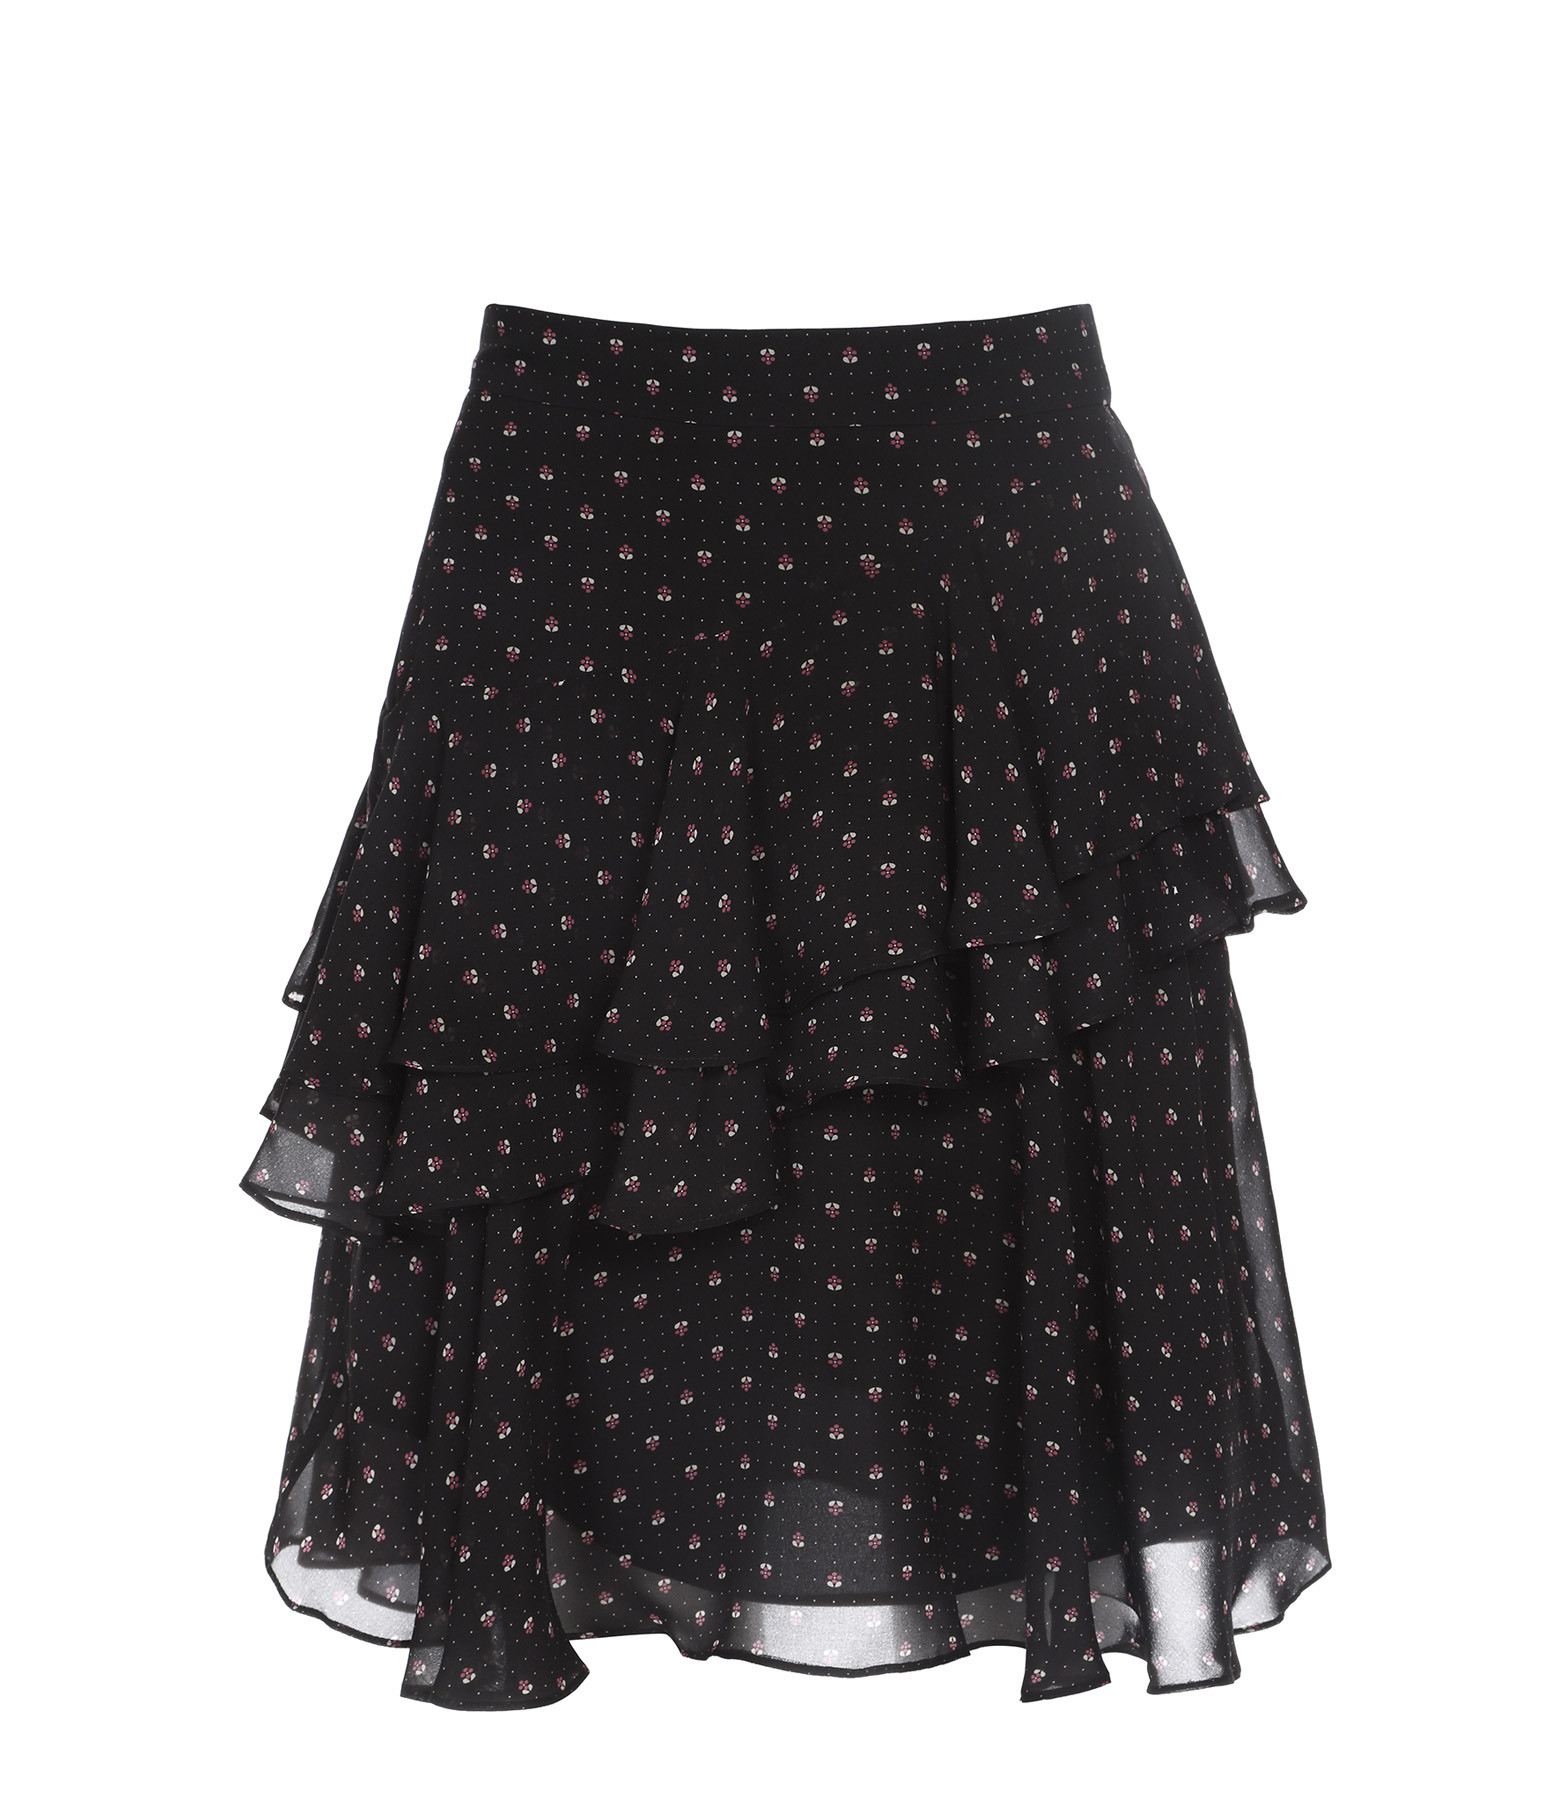 ALEXA CHUNG - Jupe Volants Imprimé Noir